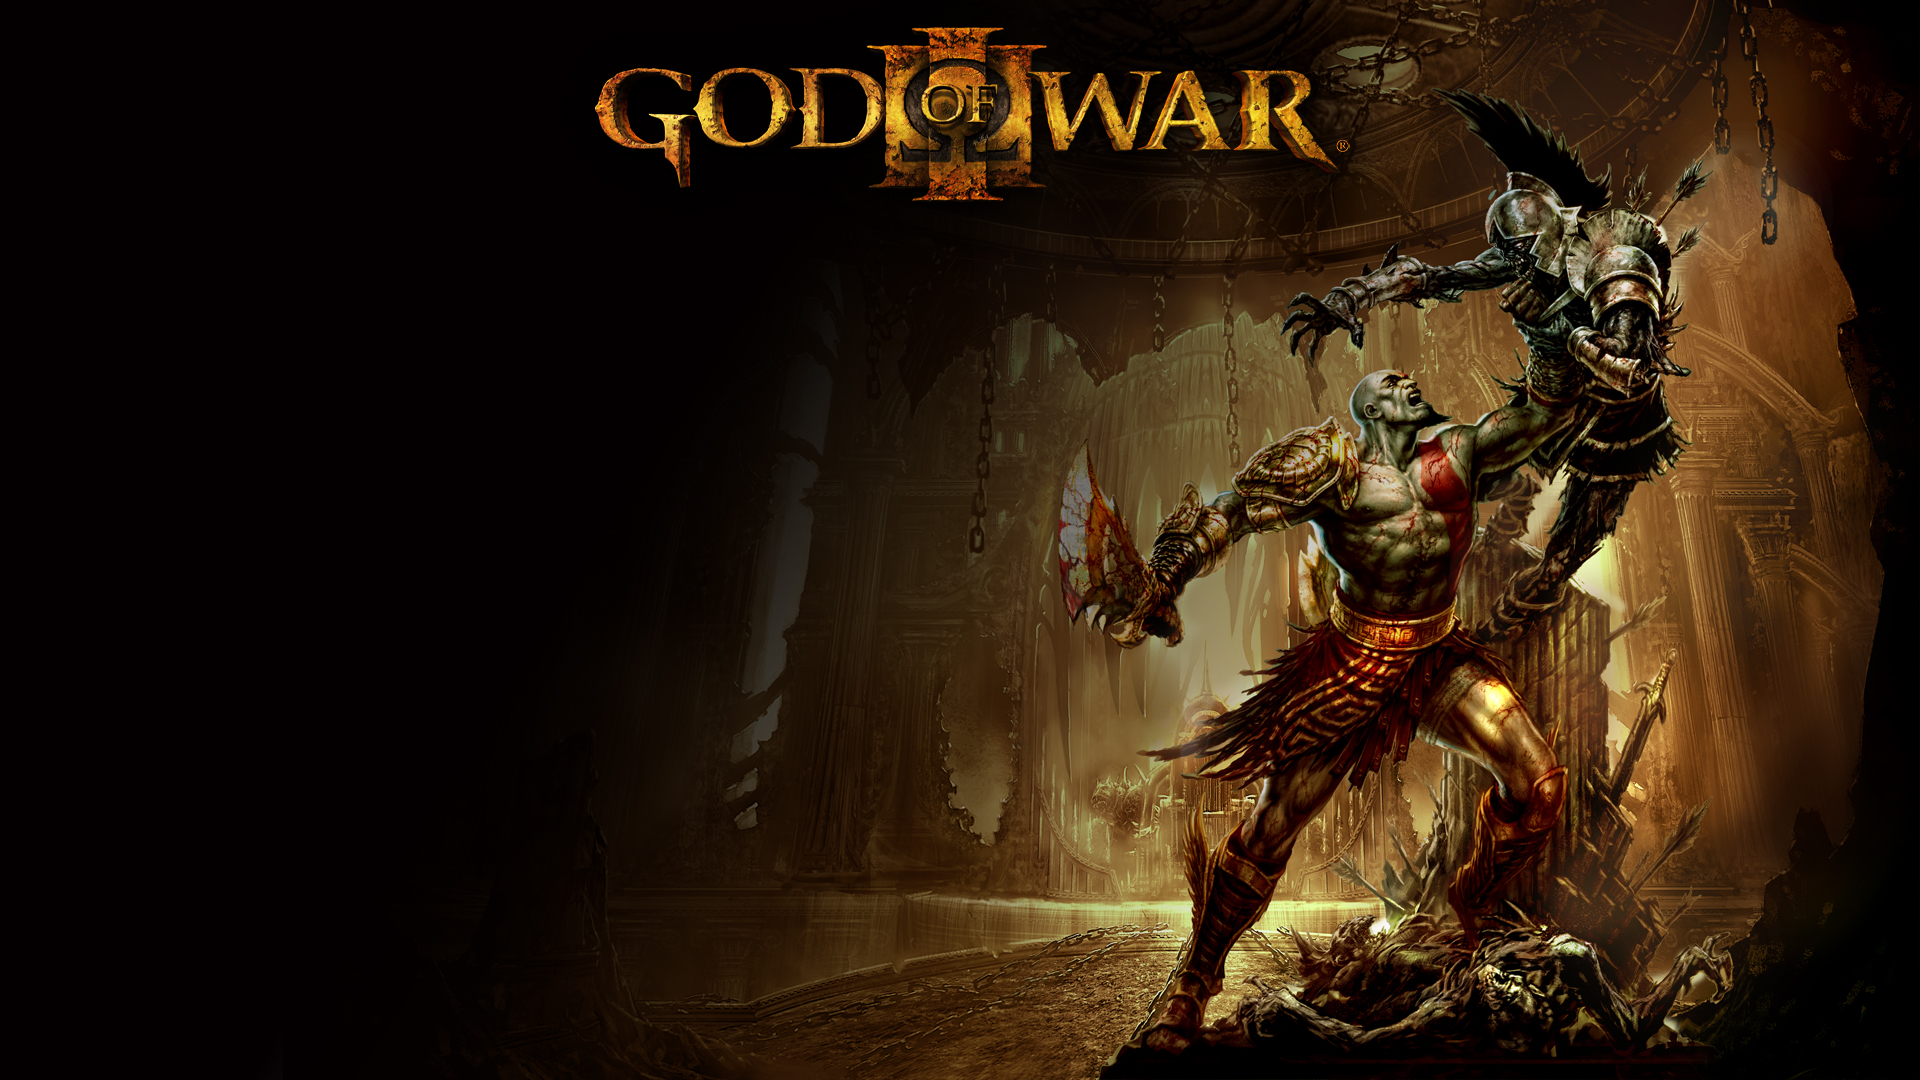 50 God Of War 4 Wallpaper On Wallpapersafari